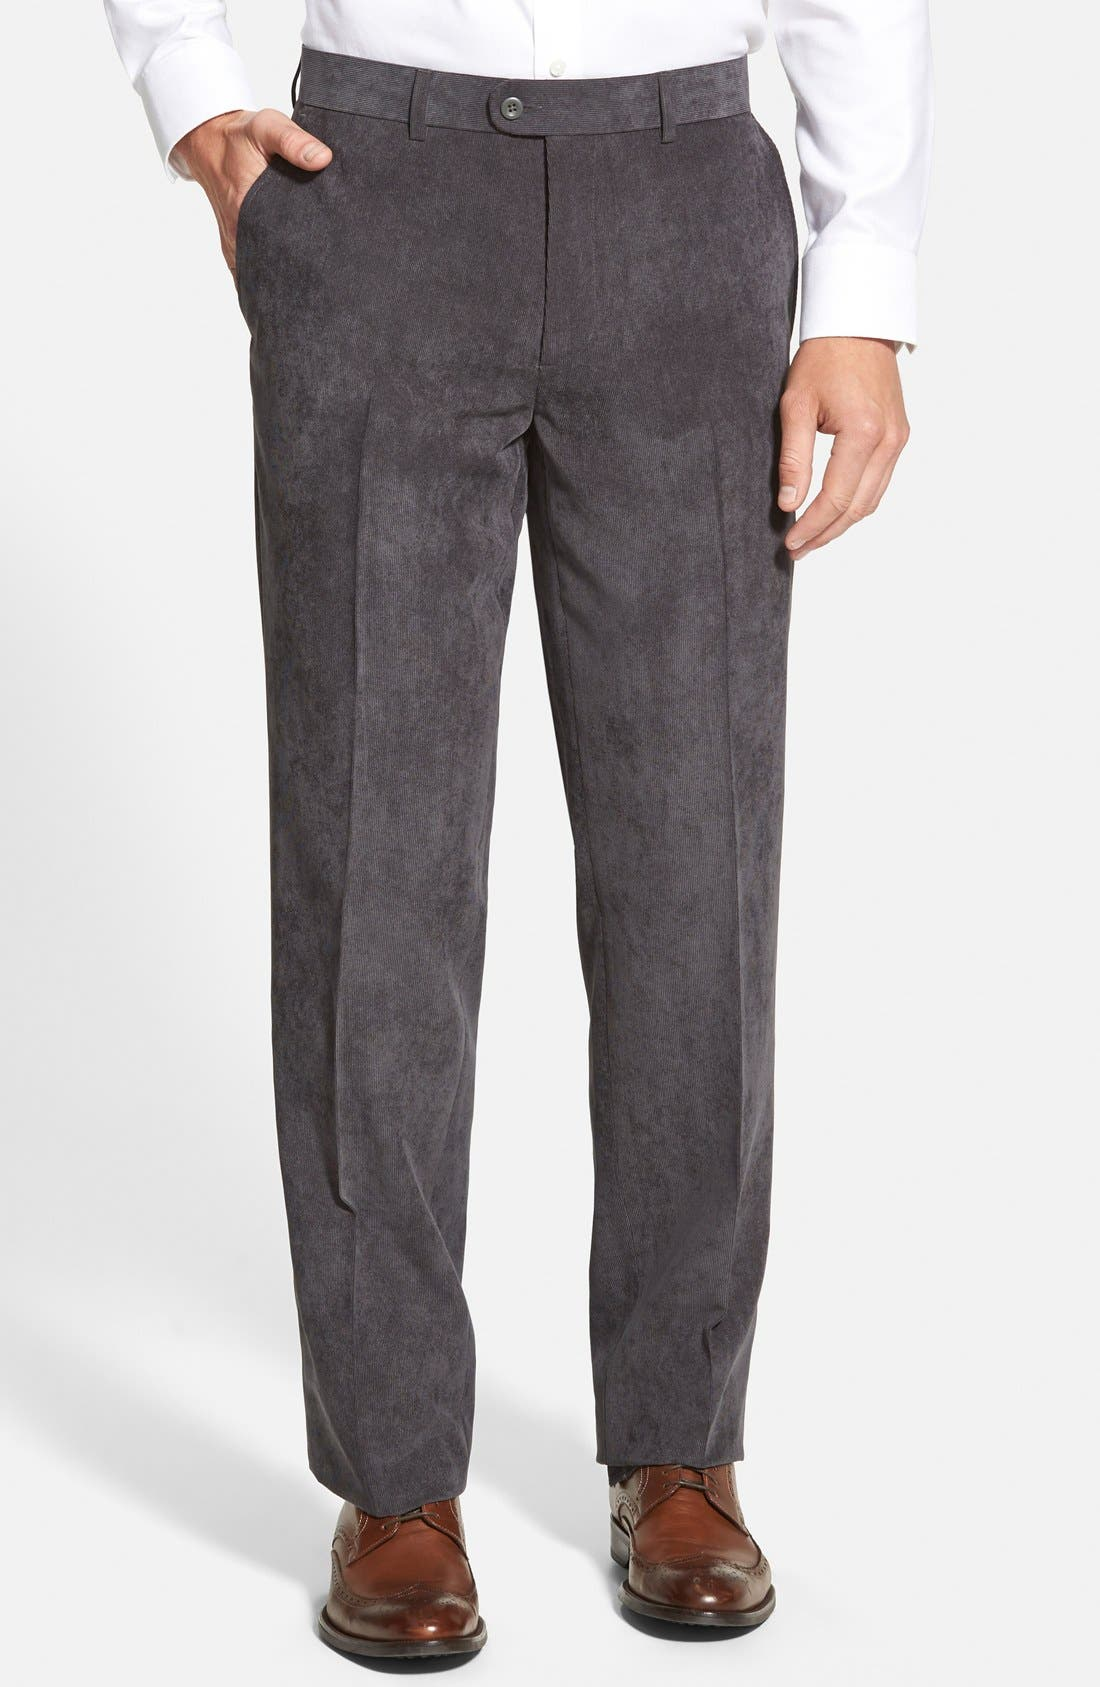 Main Image - Linea Naturale 'Micro Air' Wrinkle Resistant Microfiber Corduroy Pants